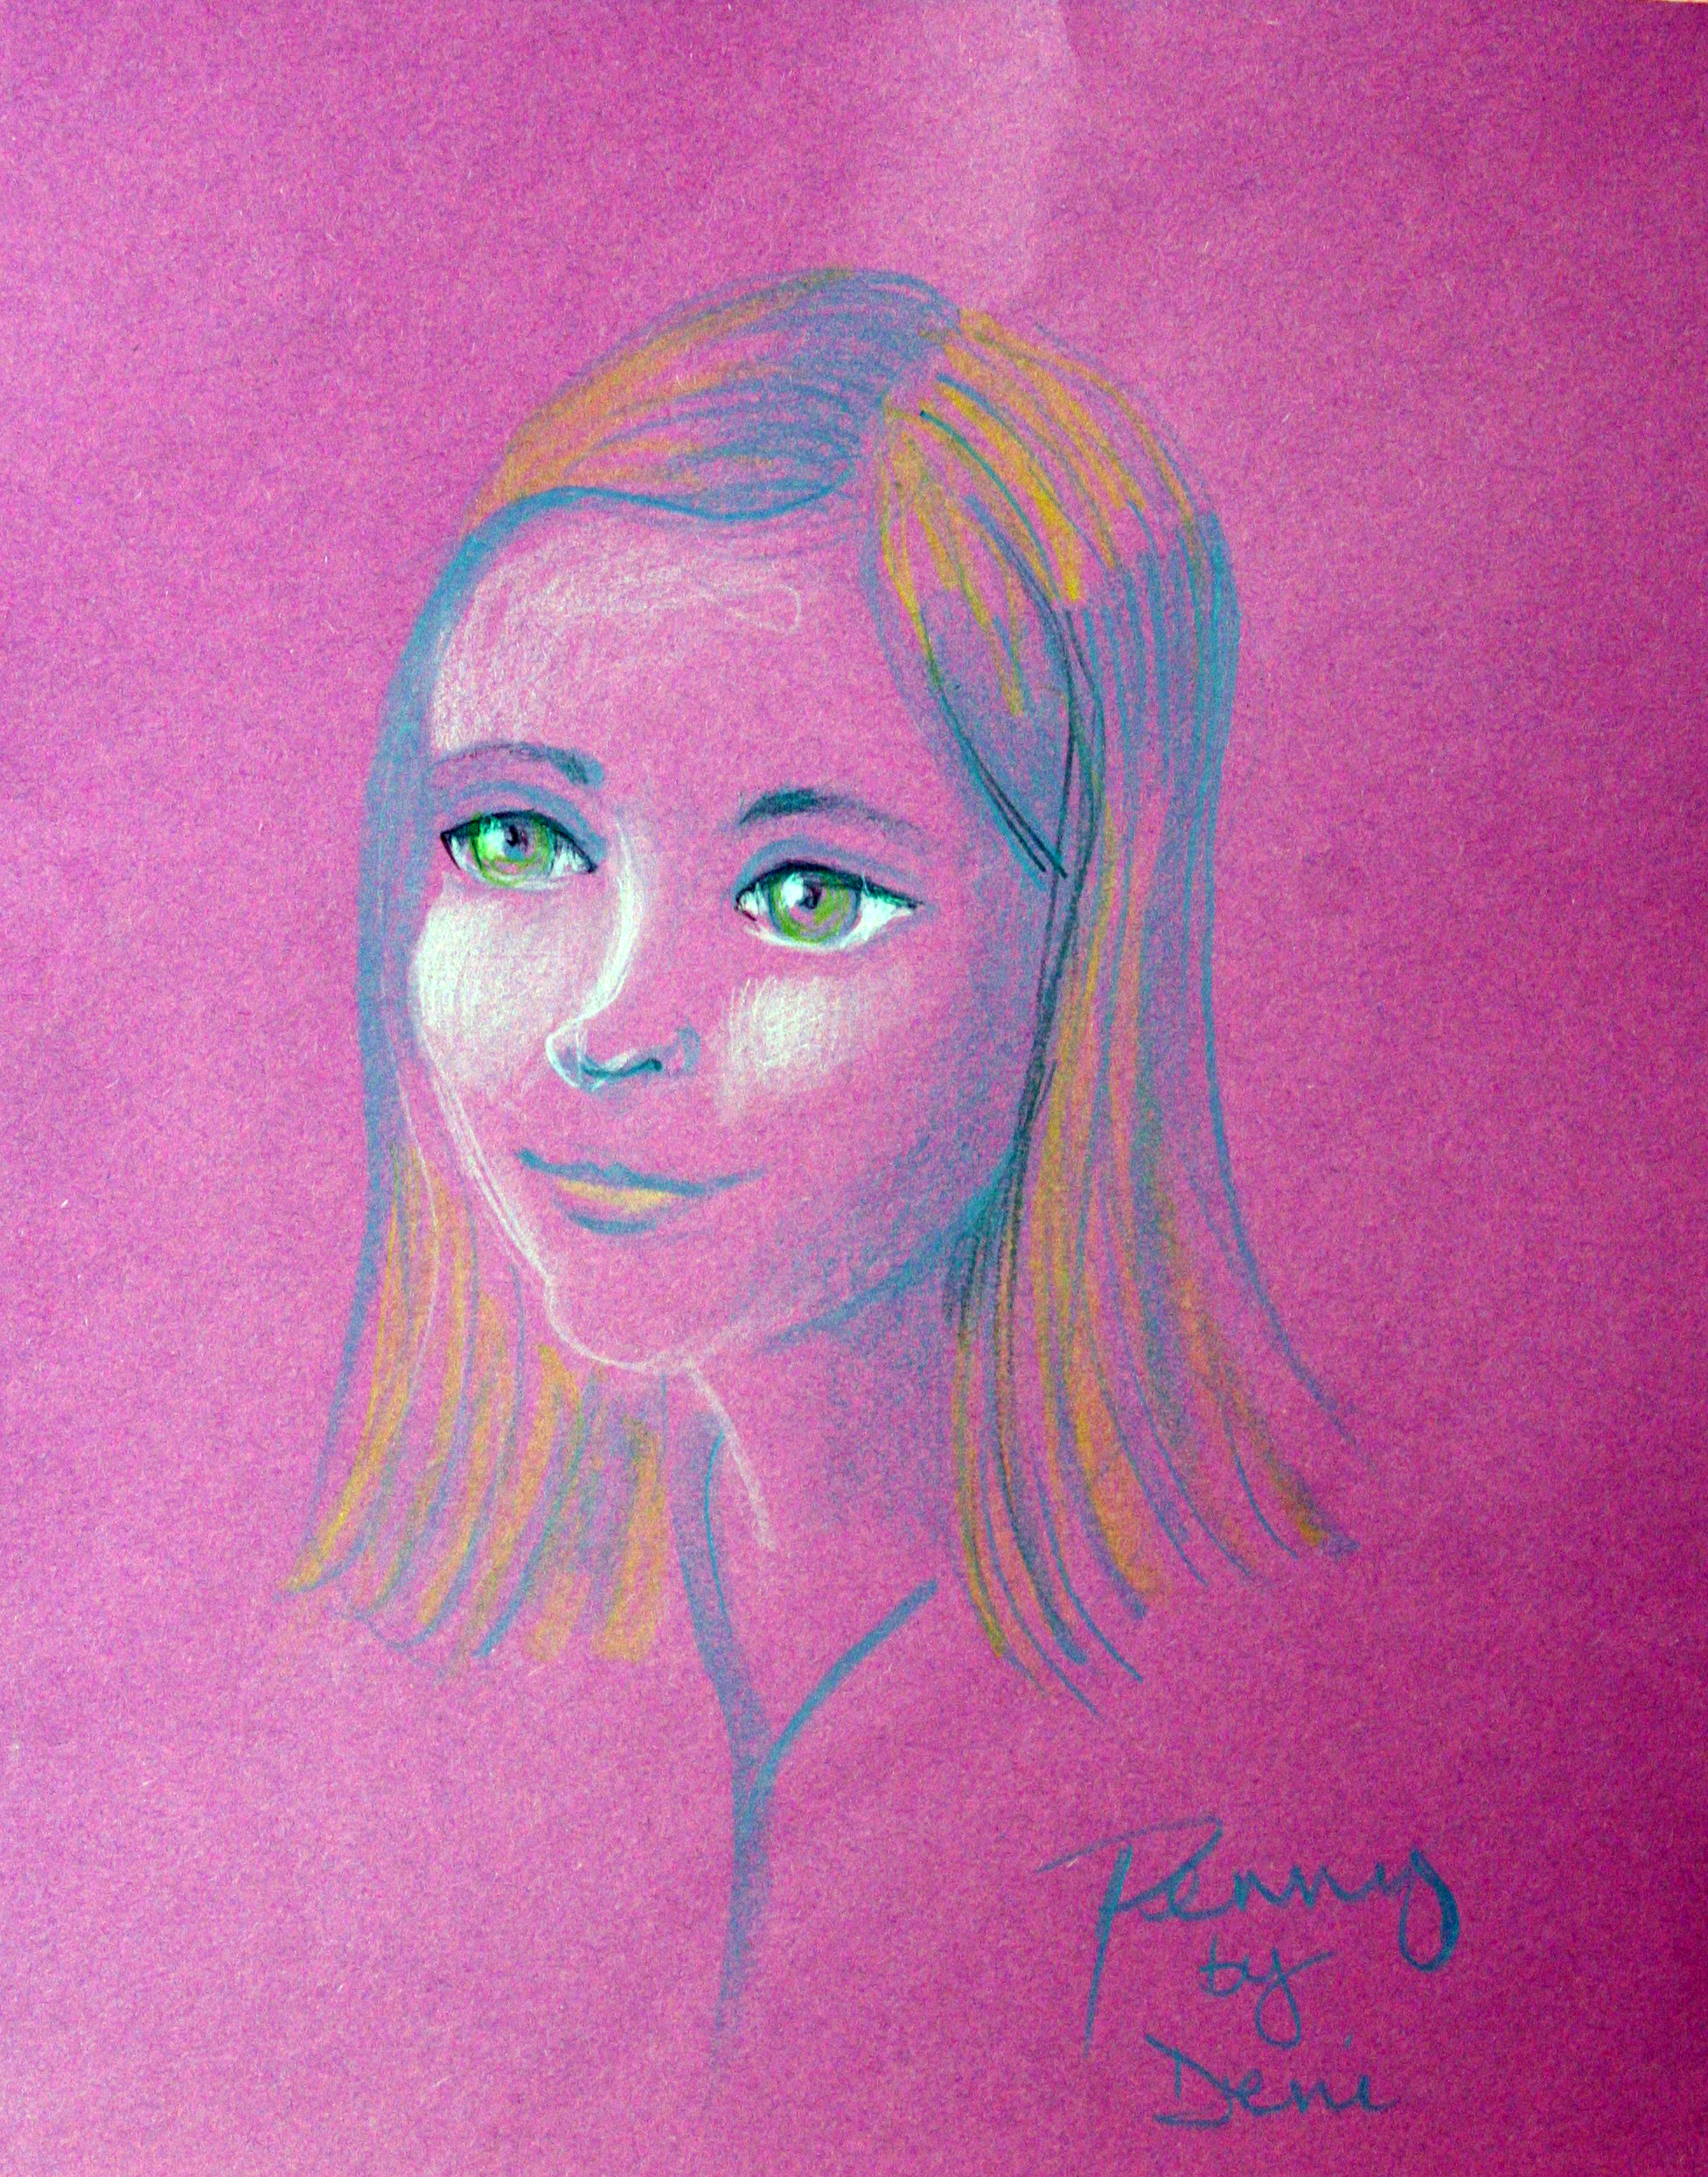 Deni Ziganti did this drawing.